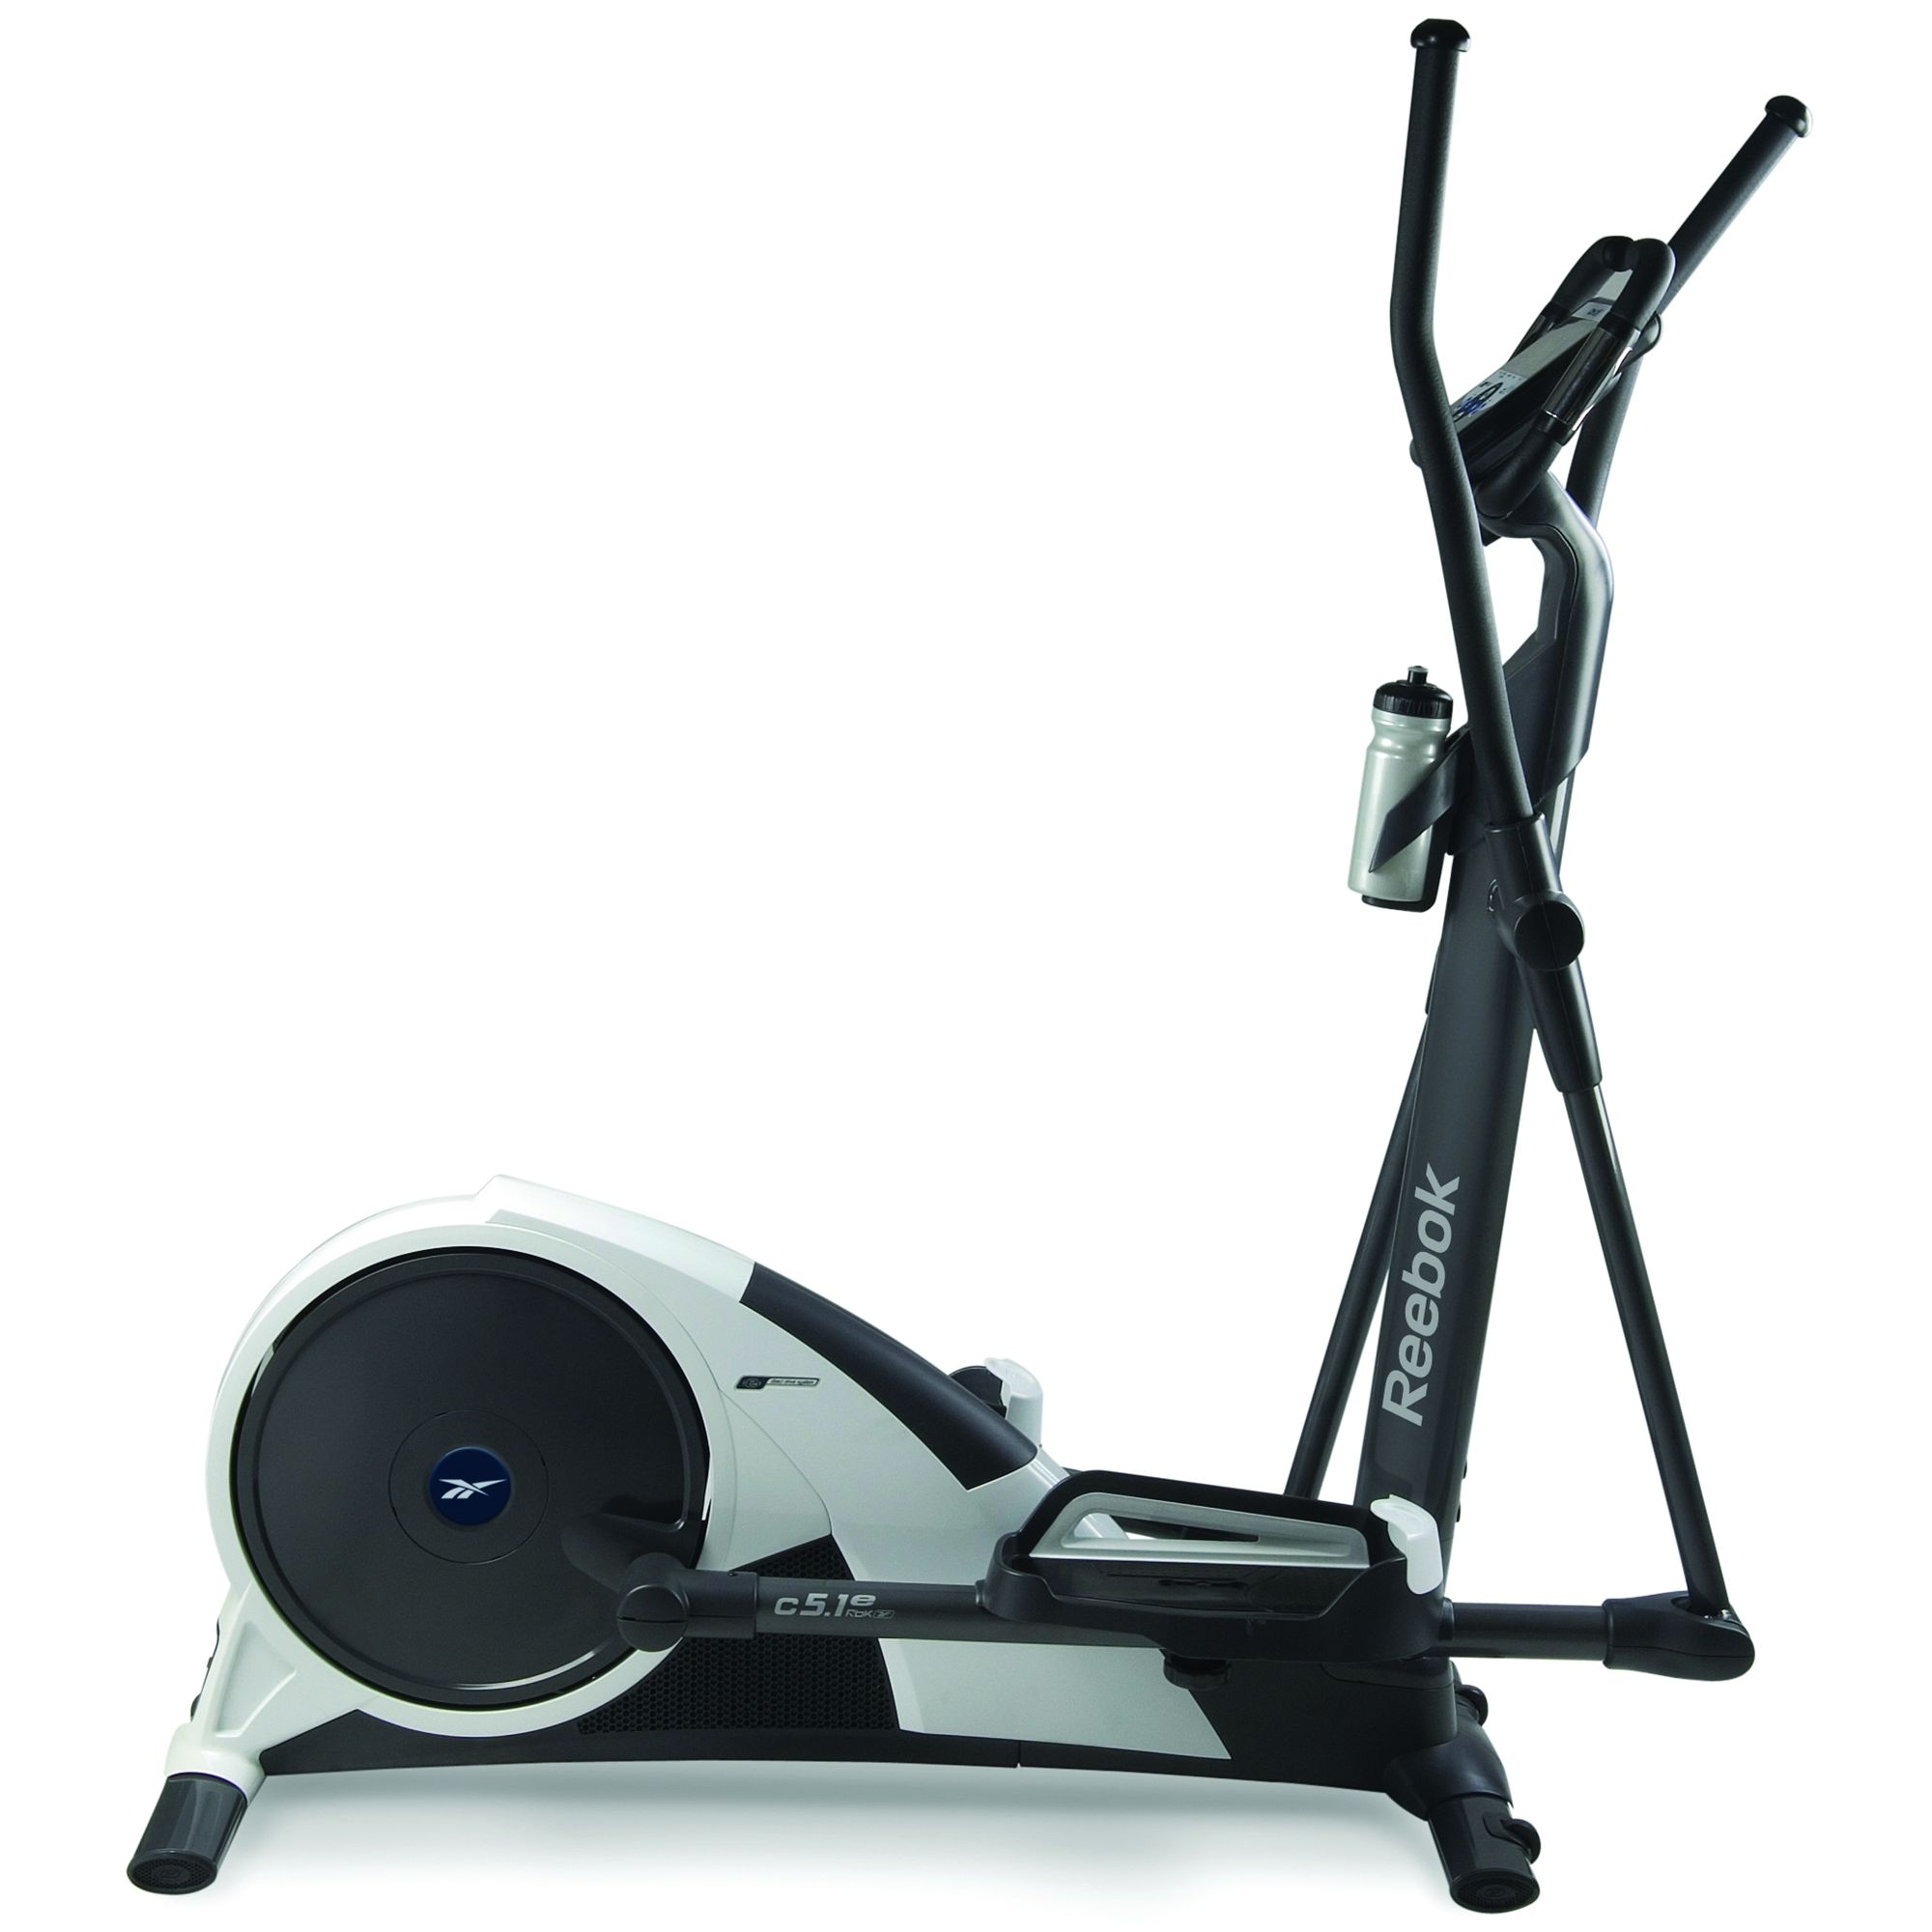 Reebok C5 1e Elliptical Cross Trainer Sweatband Com